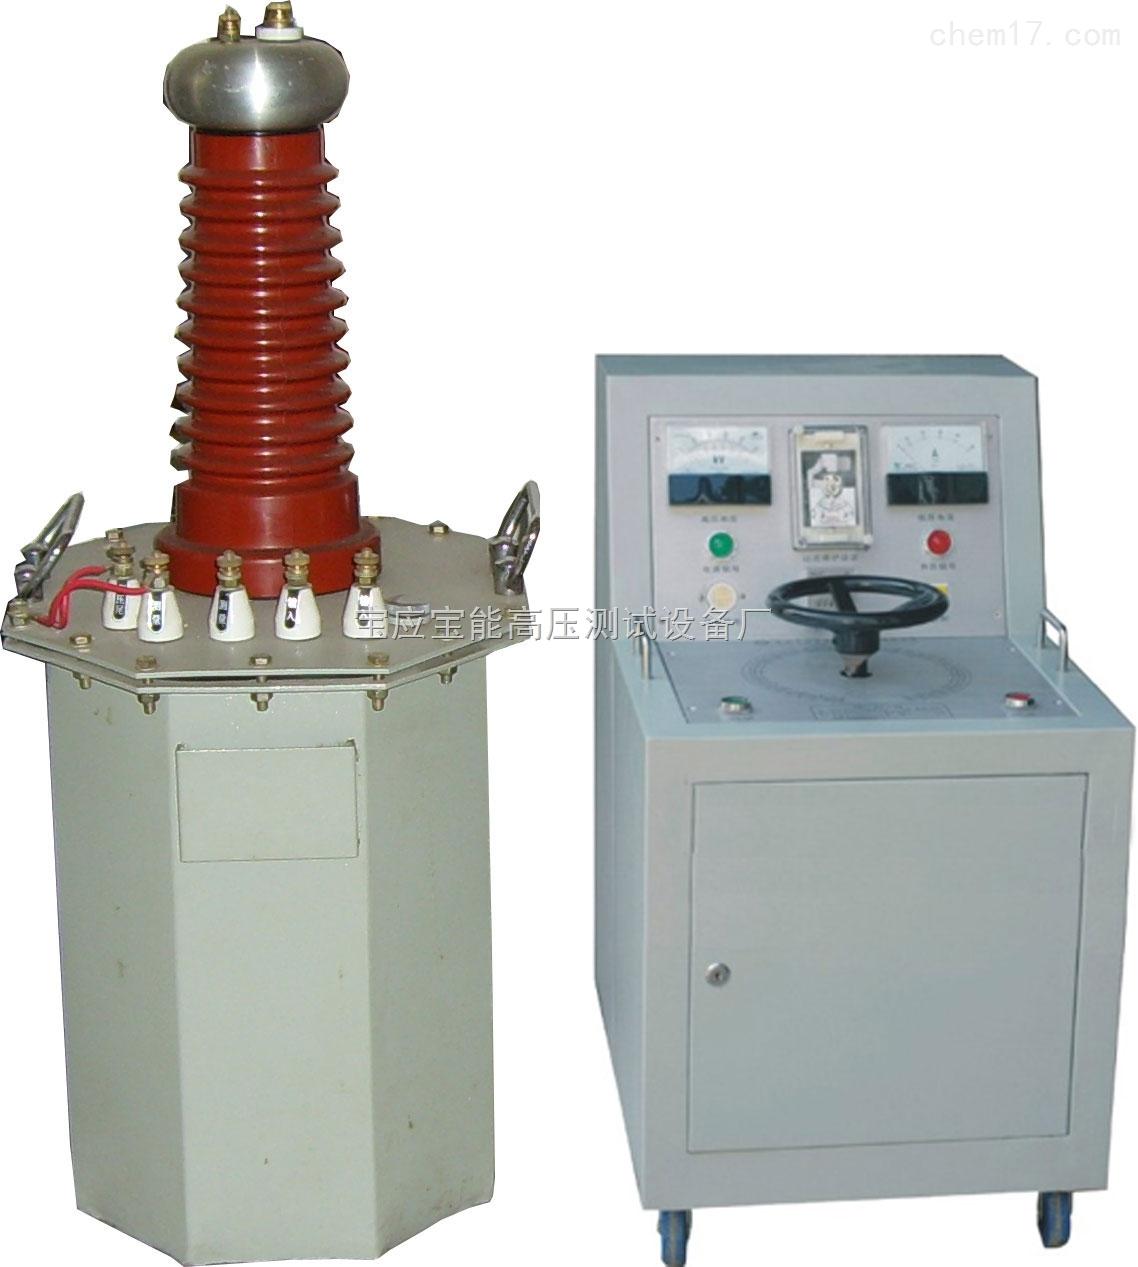 TQSB油浸式试验变压器 产品简介: TQSB油浸式试验变压器是一种新型高压测试设备,本系列产品采用单框芯式铁芯结构,初级绕组和高压绕组同轴绕制在铁芯上,从而减少漏磁通,增大绕组间的耦合。广泛应用于电力和科研单位对电机、电缆、变压器、开关、电器等产品做各种高压绝缘耐压试验。 TQSB油浸式试验变压器可用于交流工频耐压试验,如果配以同等电压等级和同等容量的电容、硅堆及高压直流微安表,便可组装成直流高压试验装置,可以测量高压直流泄漏电流。 TQSB油浸式试验变压器产品特性: 产品的整体结构紧凑,通用性强,使用